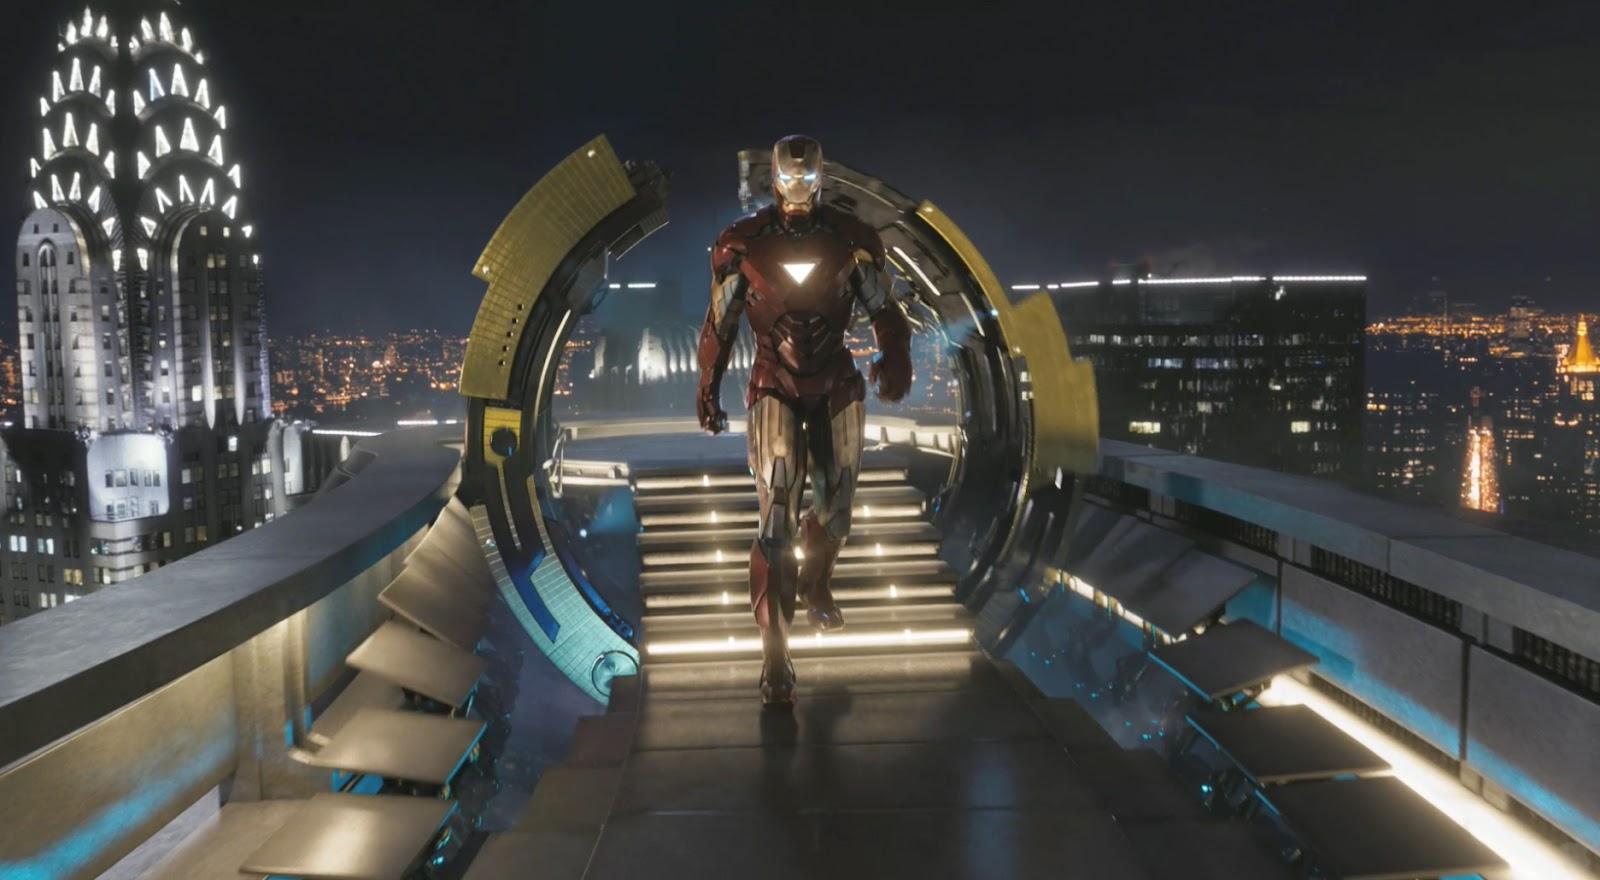 http://3.bp.blogspot.com/-_iMl-ZzmlzQ/T52TCV9C4QI/AAAAAAAABx8/t7madoNiISY/s1600/Robert-Downey-Jr-The-Avengers-Iron-Man-5.jpg